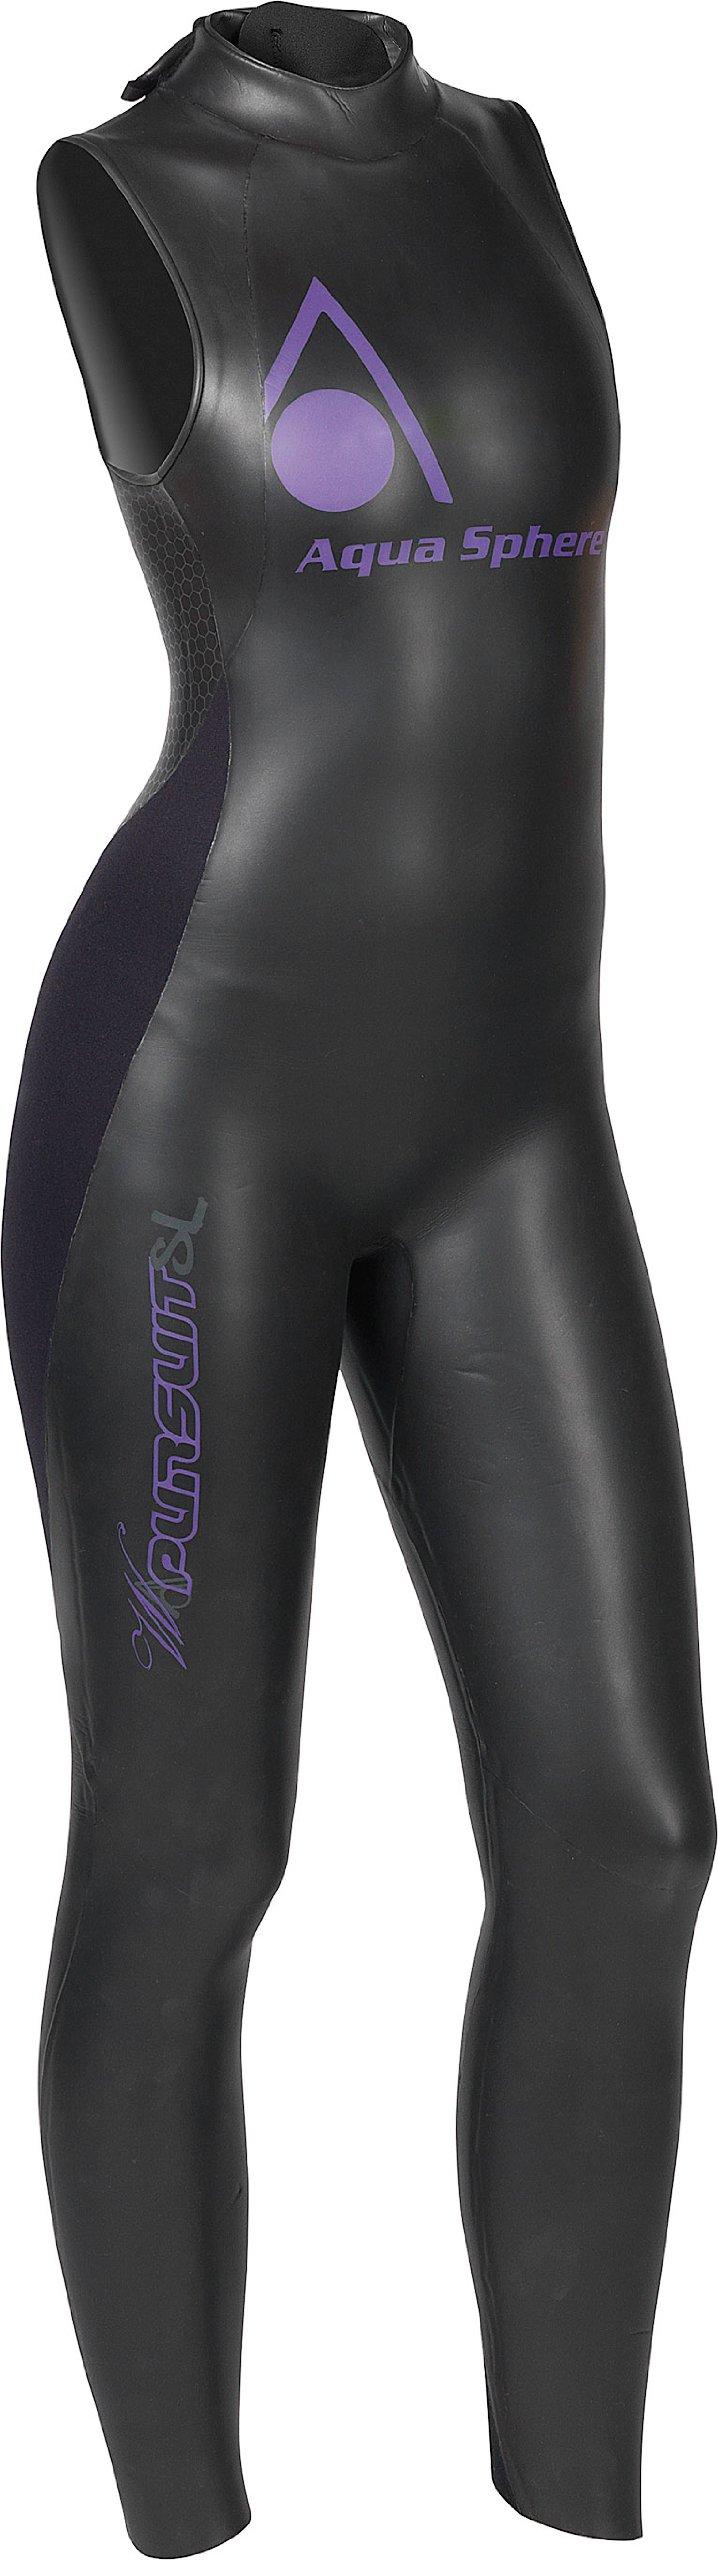 Aqua Sphere Women's Pursuit Sleeveless Wetsuit - 2015 by Aqua Sphere